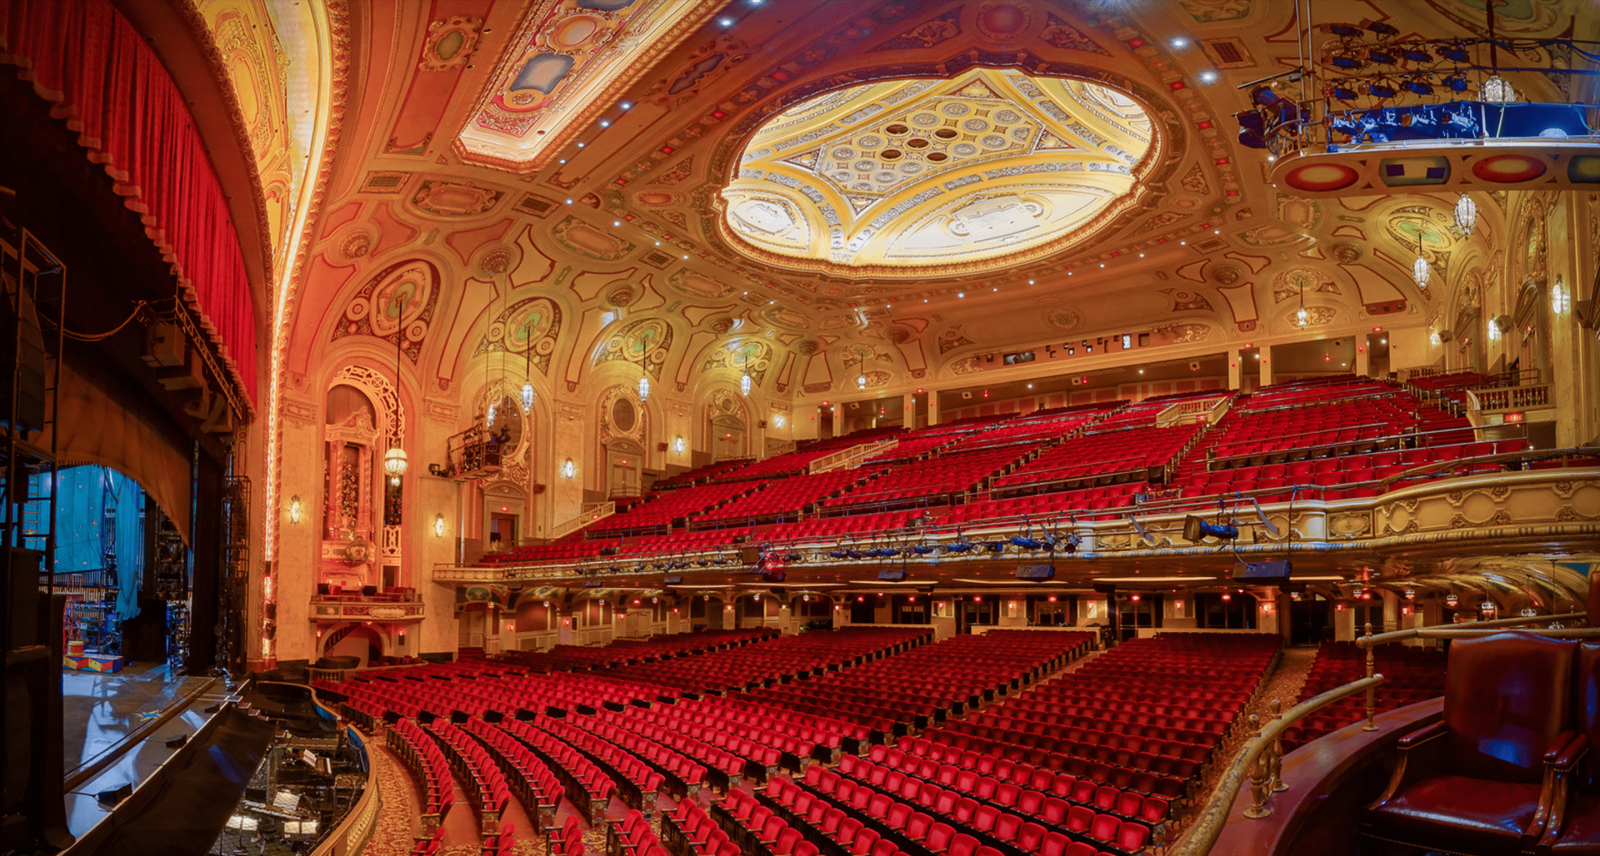 Shea's Performing Arts Center - Wurlitzer Theater Organ